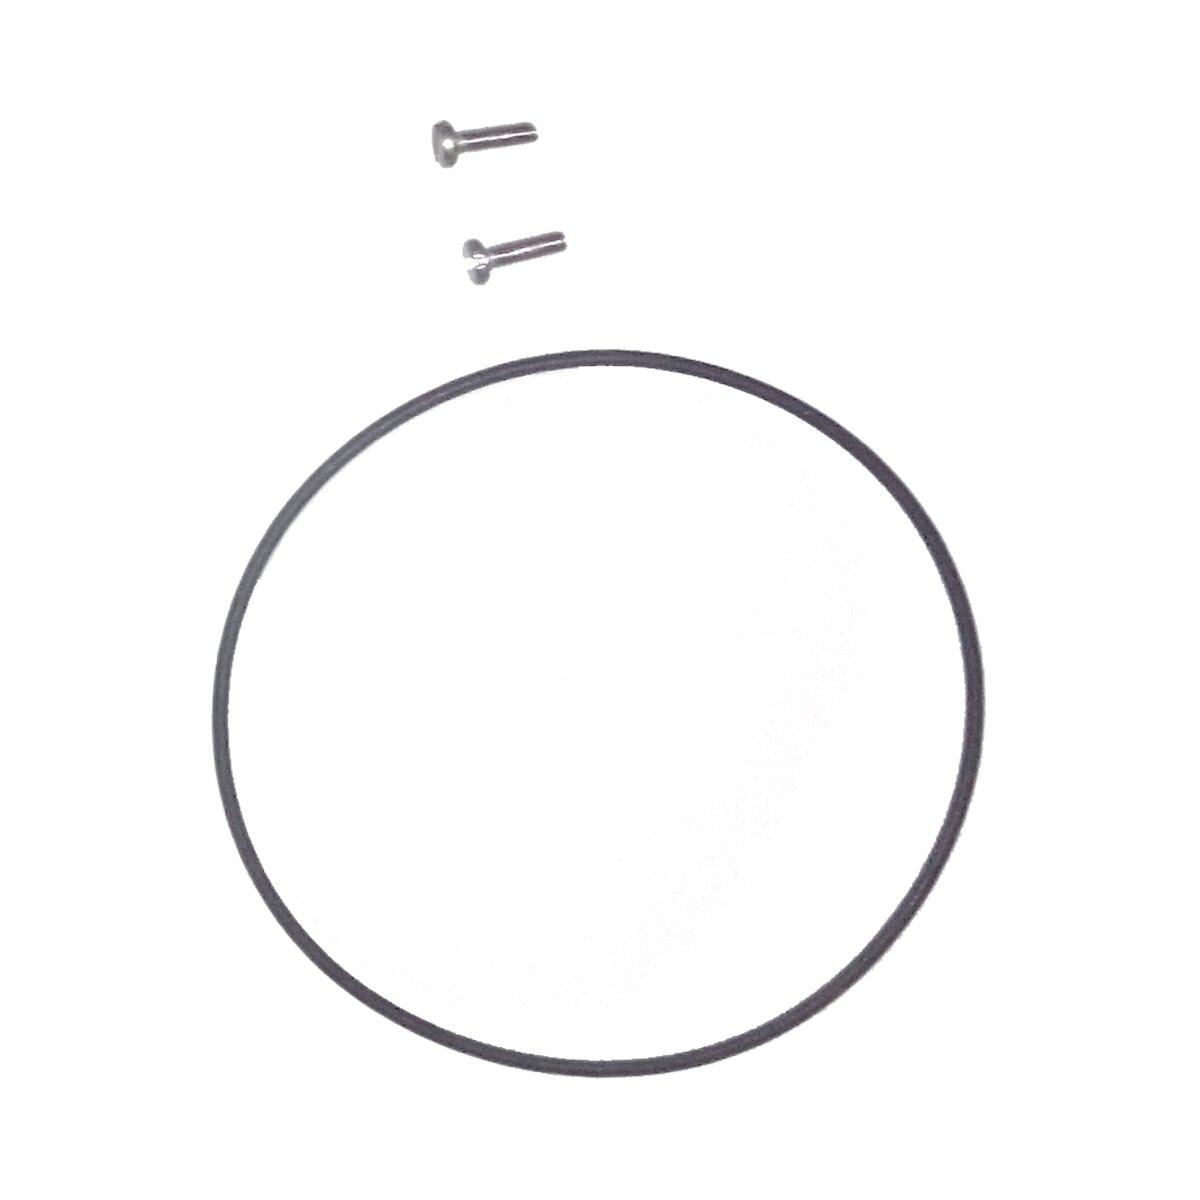 O-Ring Batterie-Wechsel-Kit MARES Puck Mission 3 Batterie Konsole 2